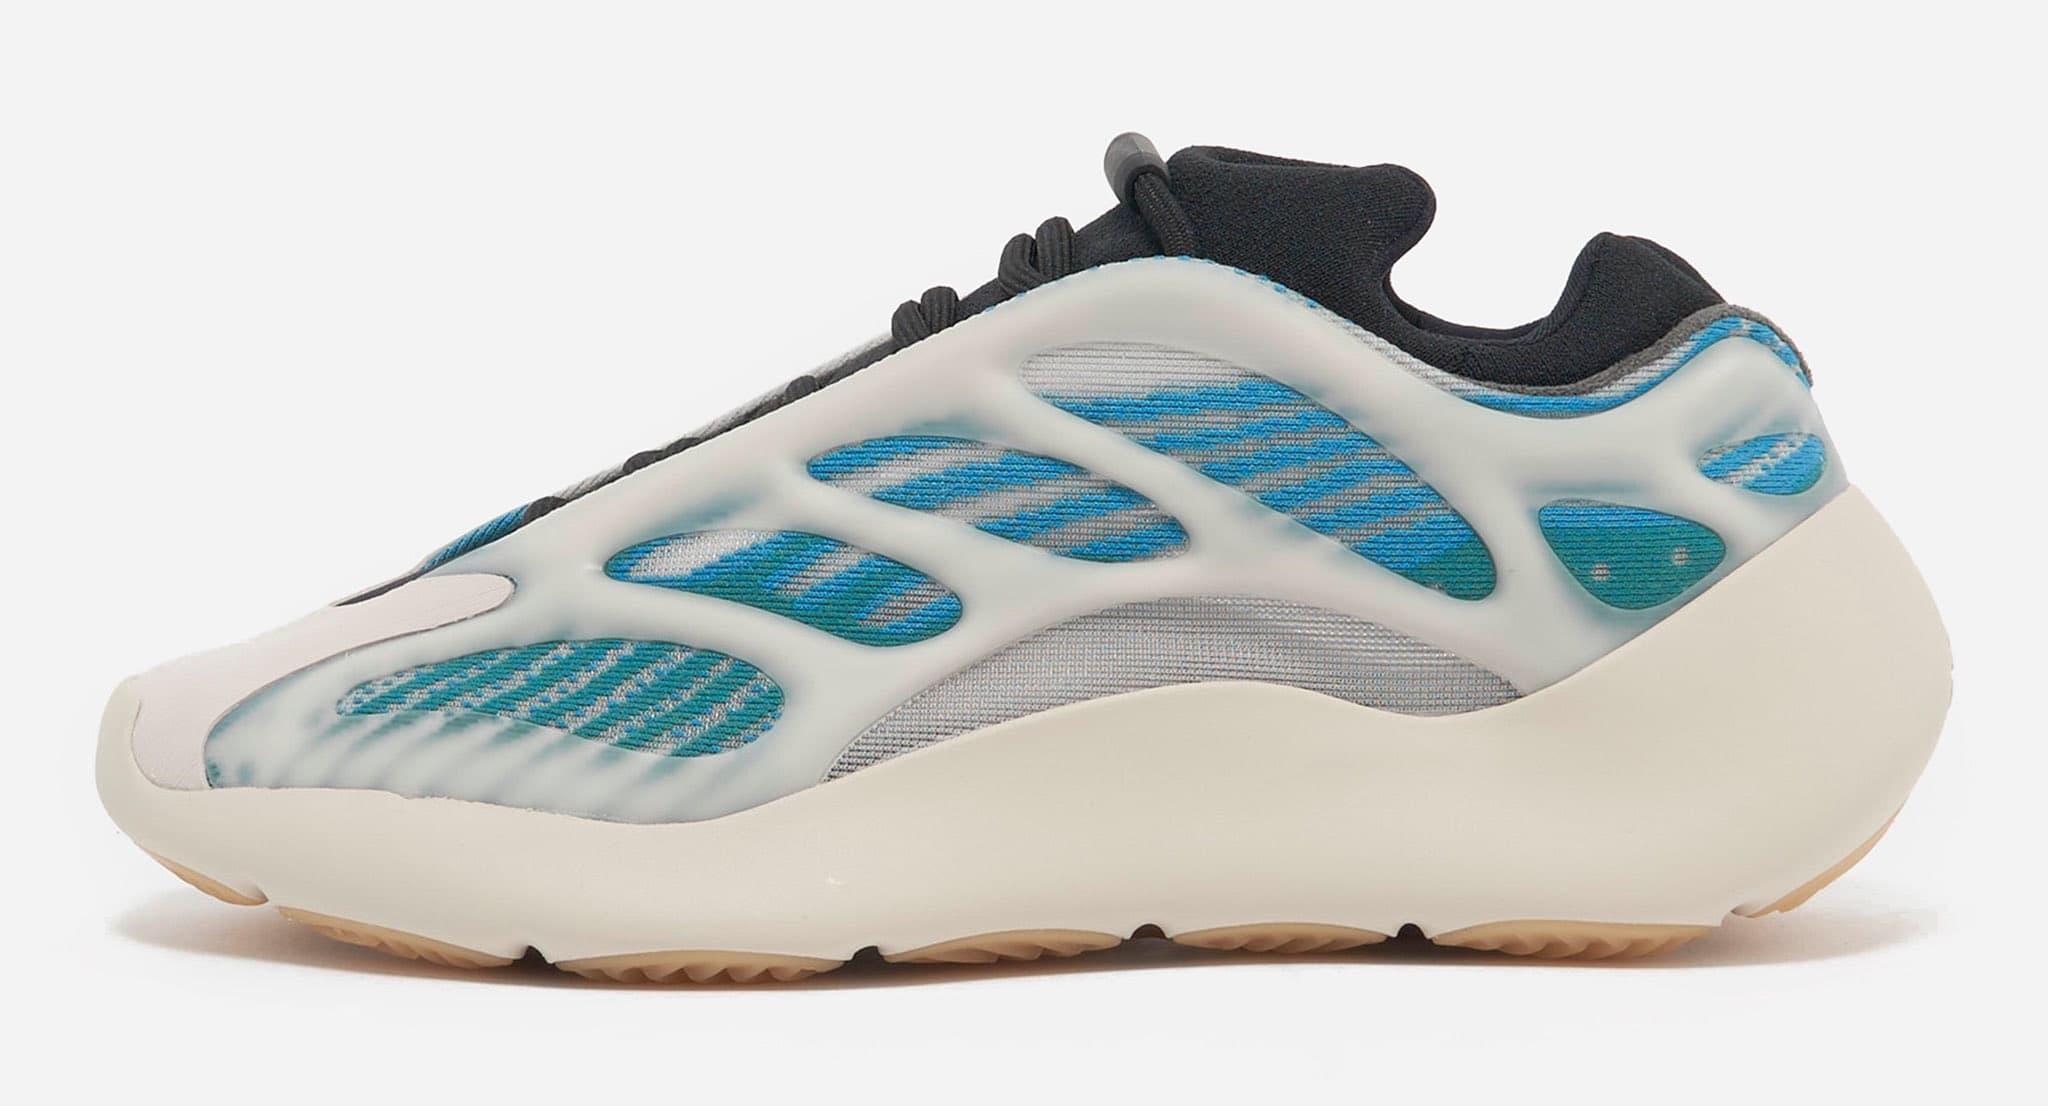 Adidas Yeezy 700 V3 'Kyanite' Lateral